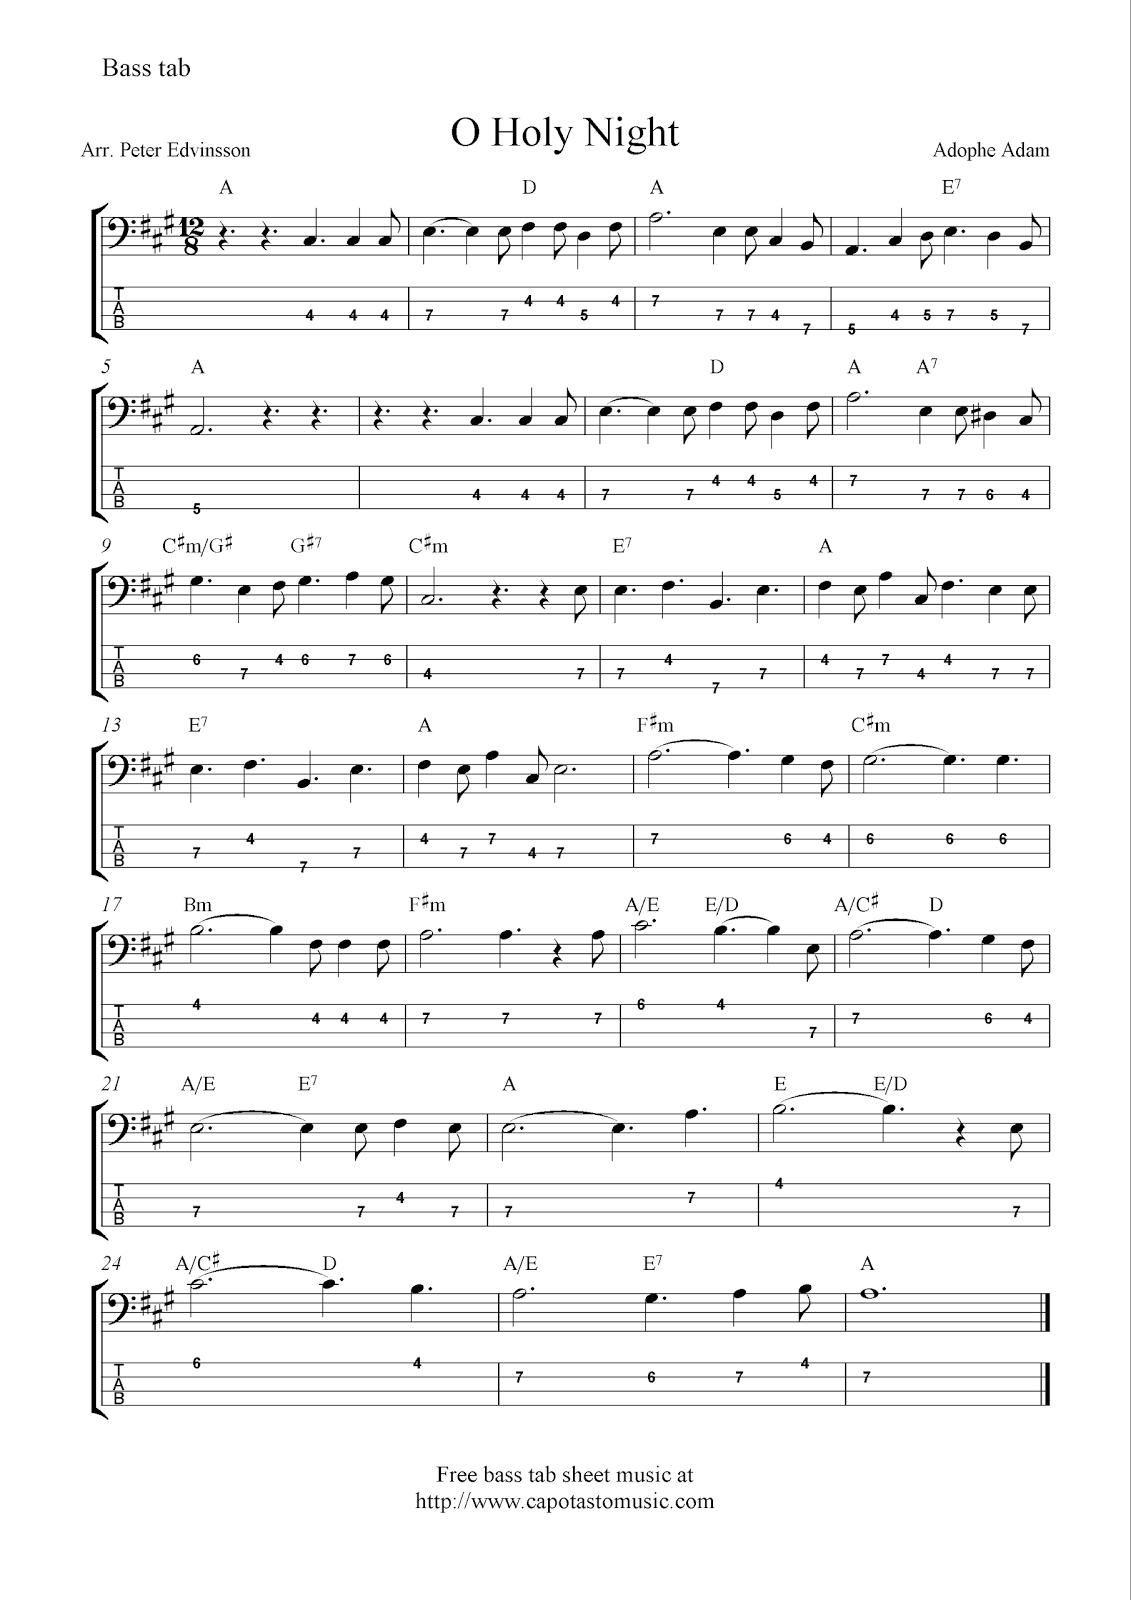 O Holy Night, free Christmas bass tab sheet music notes